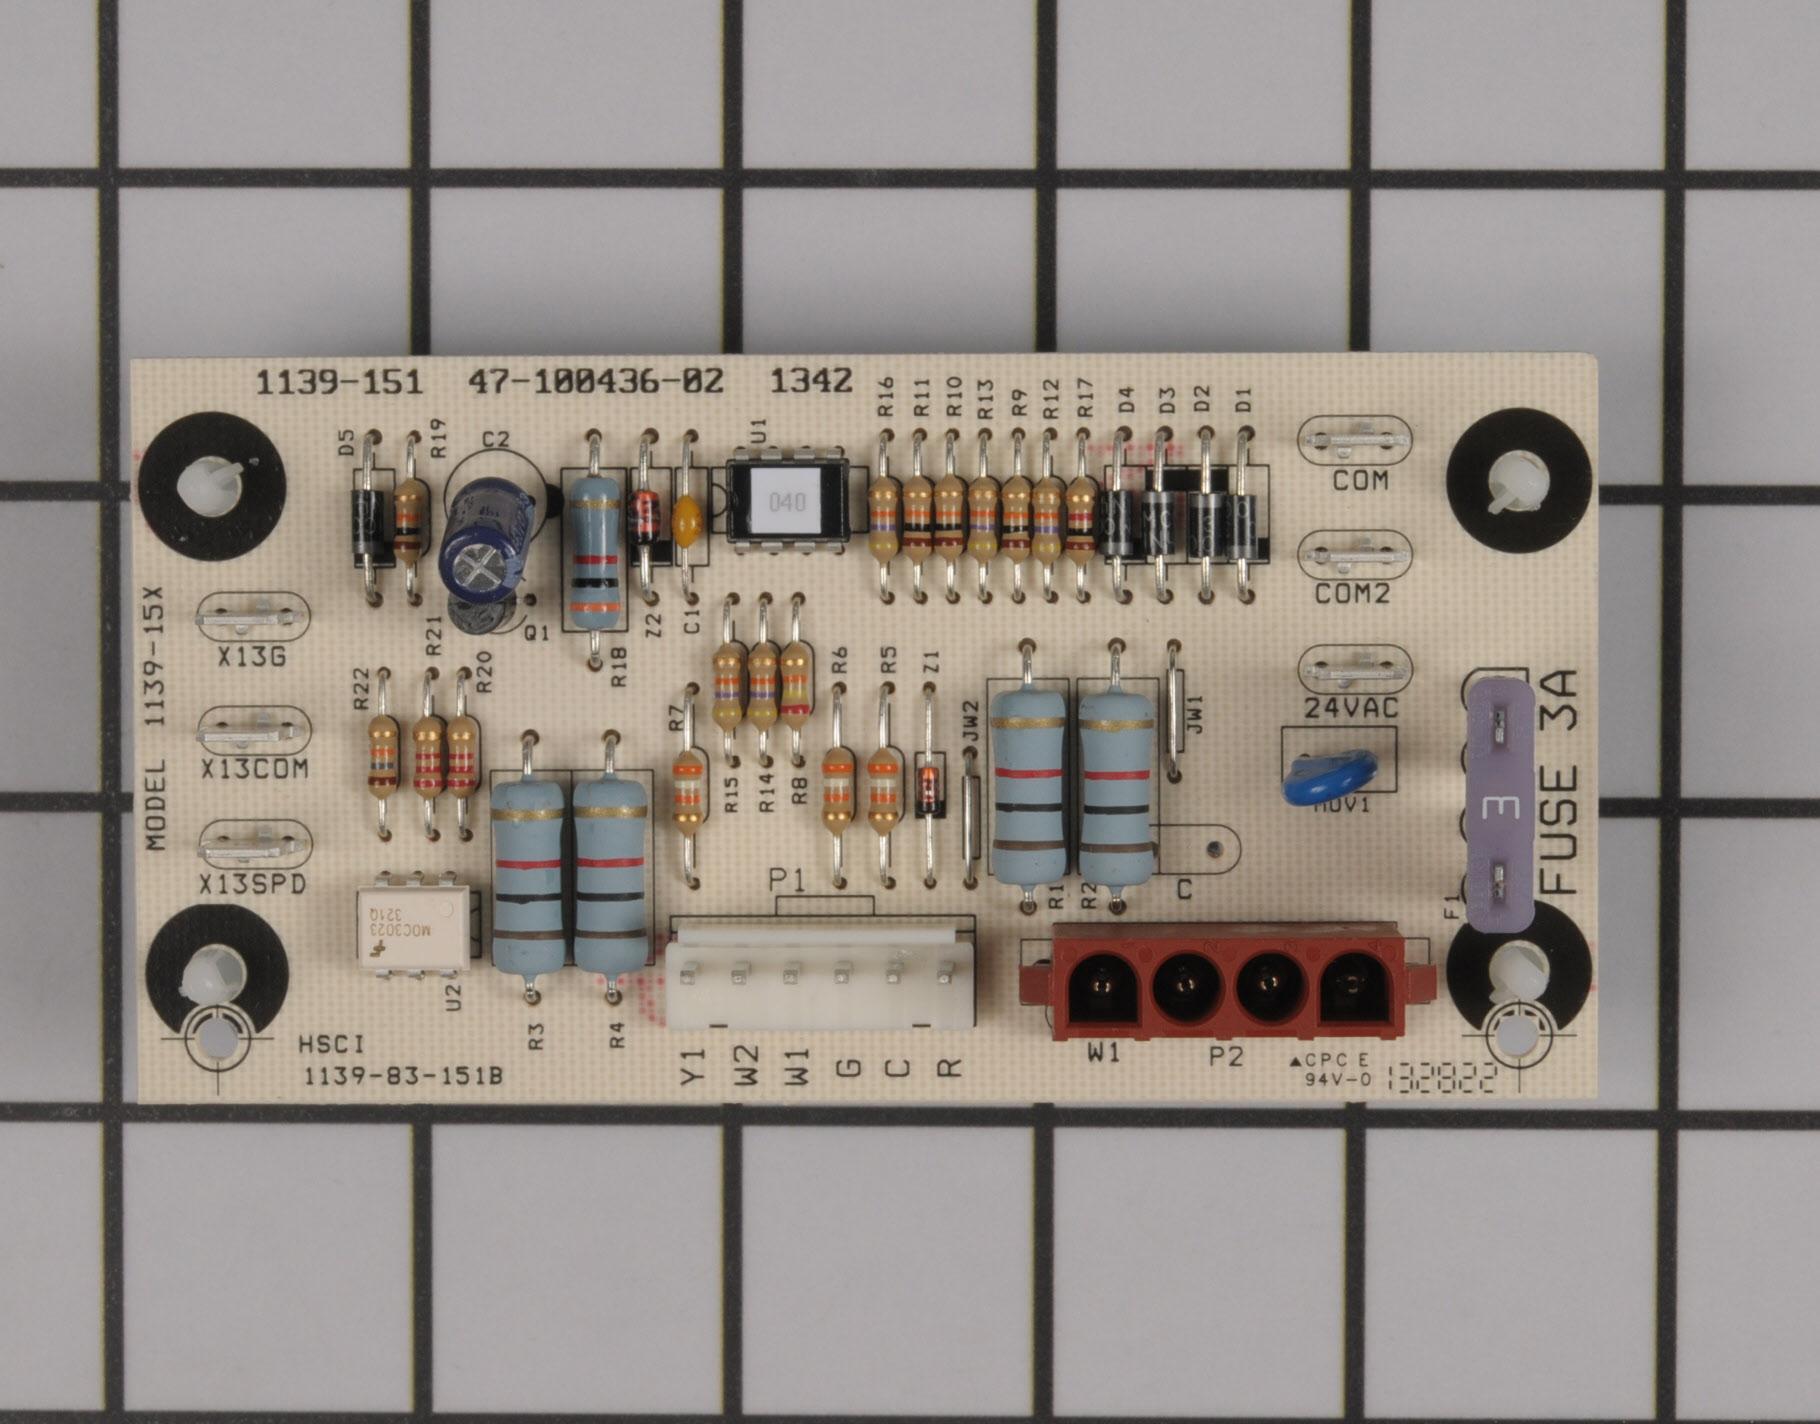 47-100436-02 WeatherKing Air Handler Part -Control Board